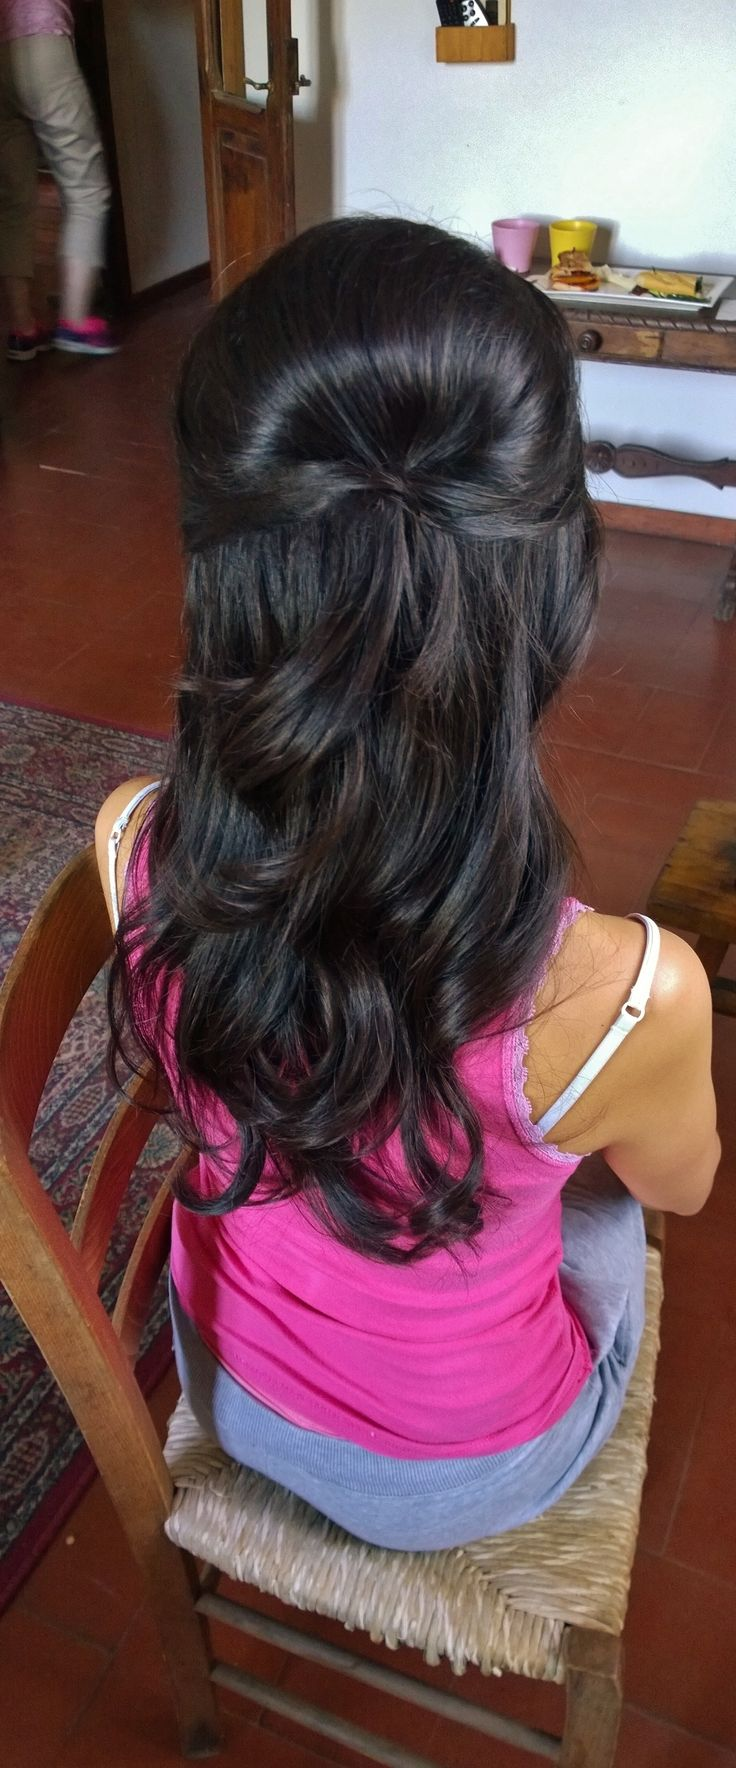 Italy wedding hair stylist and soft wavy half up wedding hairstyle by Janita Helova www.janitahelova.com